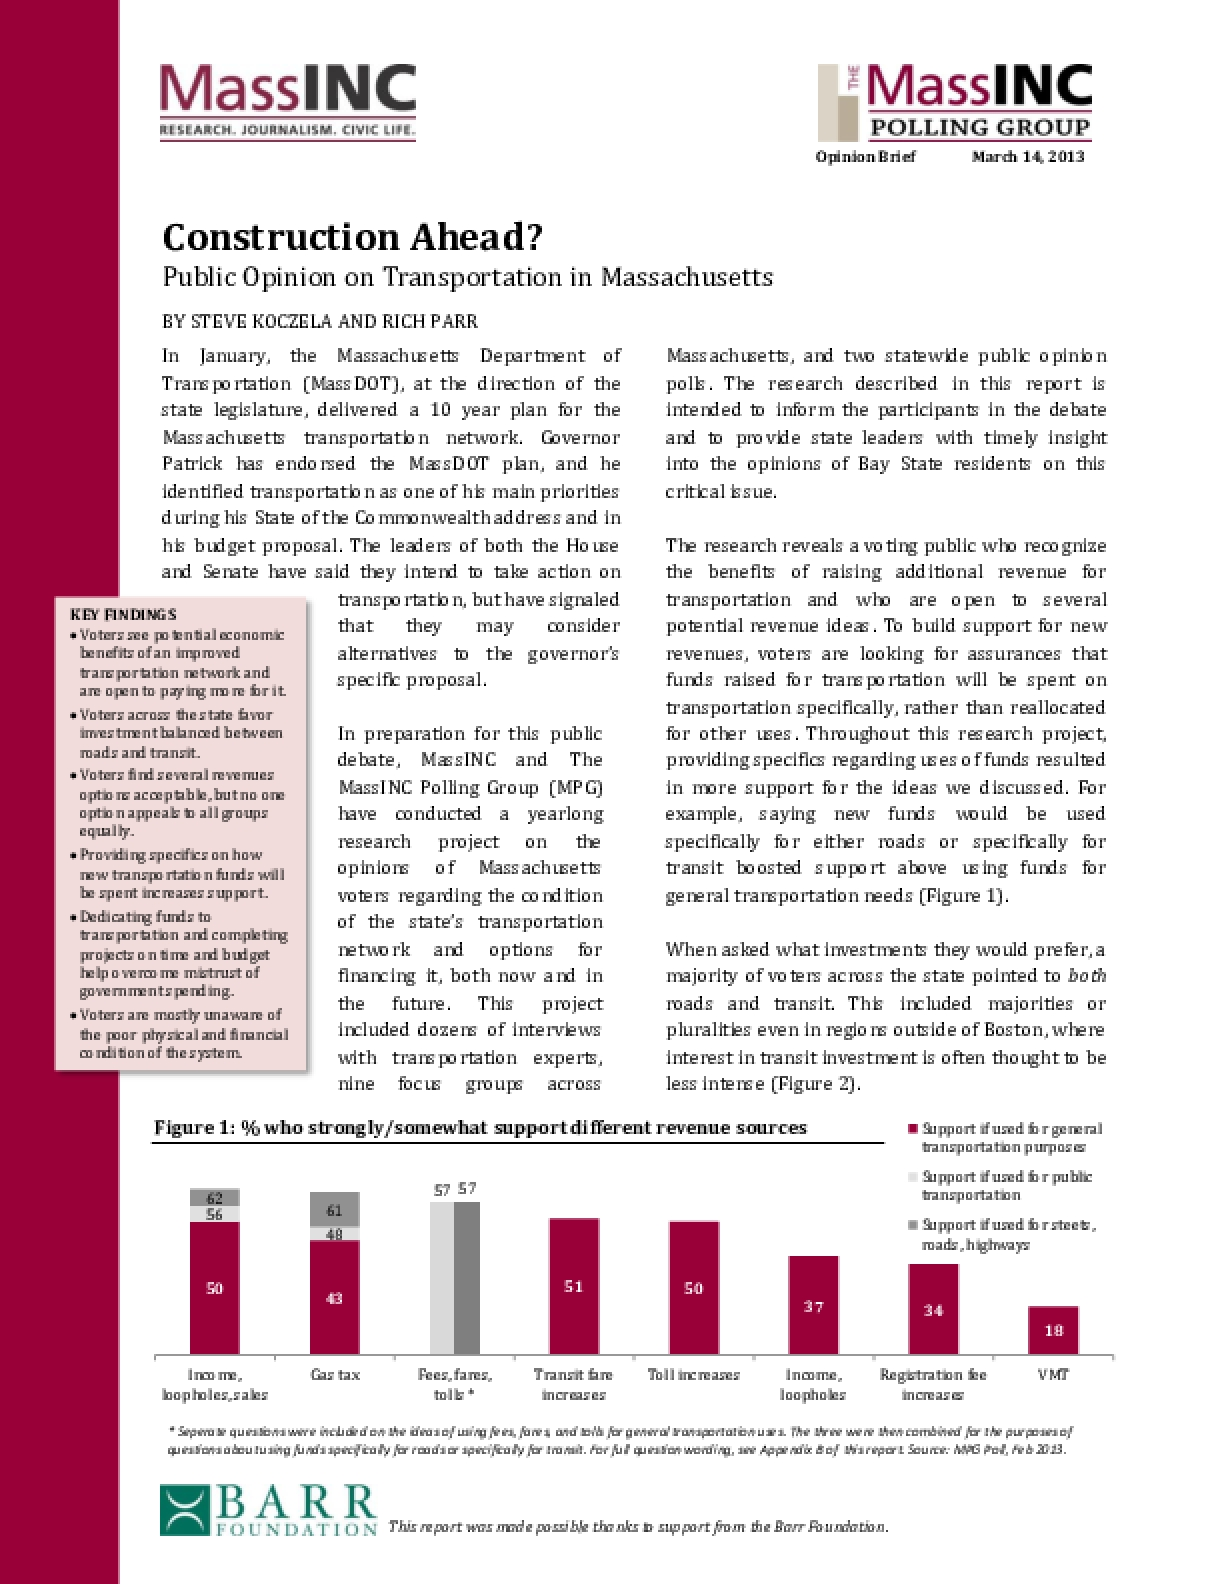 Construction Ahead? Public Opinion on Transportation in Massachusetts